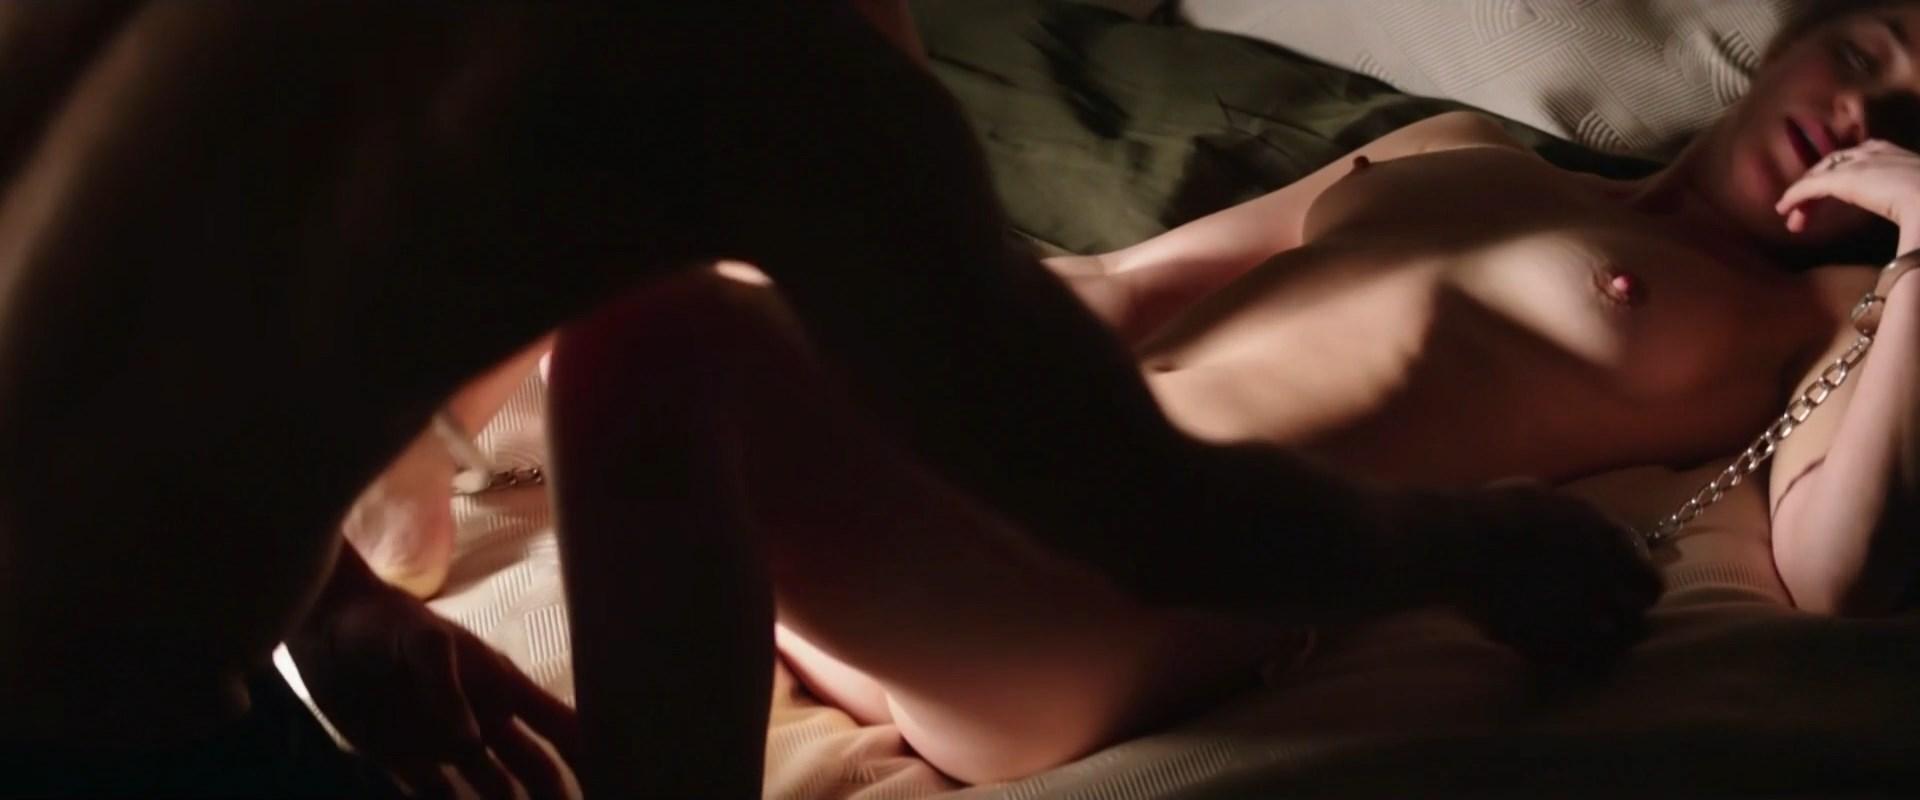 TheFappeningBlog.com-Dakota-Johnson-Nude-Fifty-Shades-Freed-2018-9.jpg